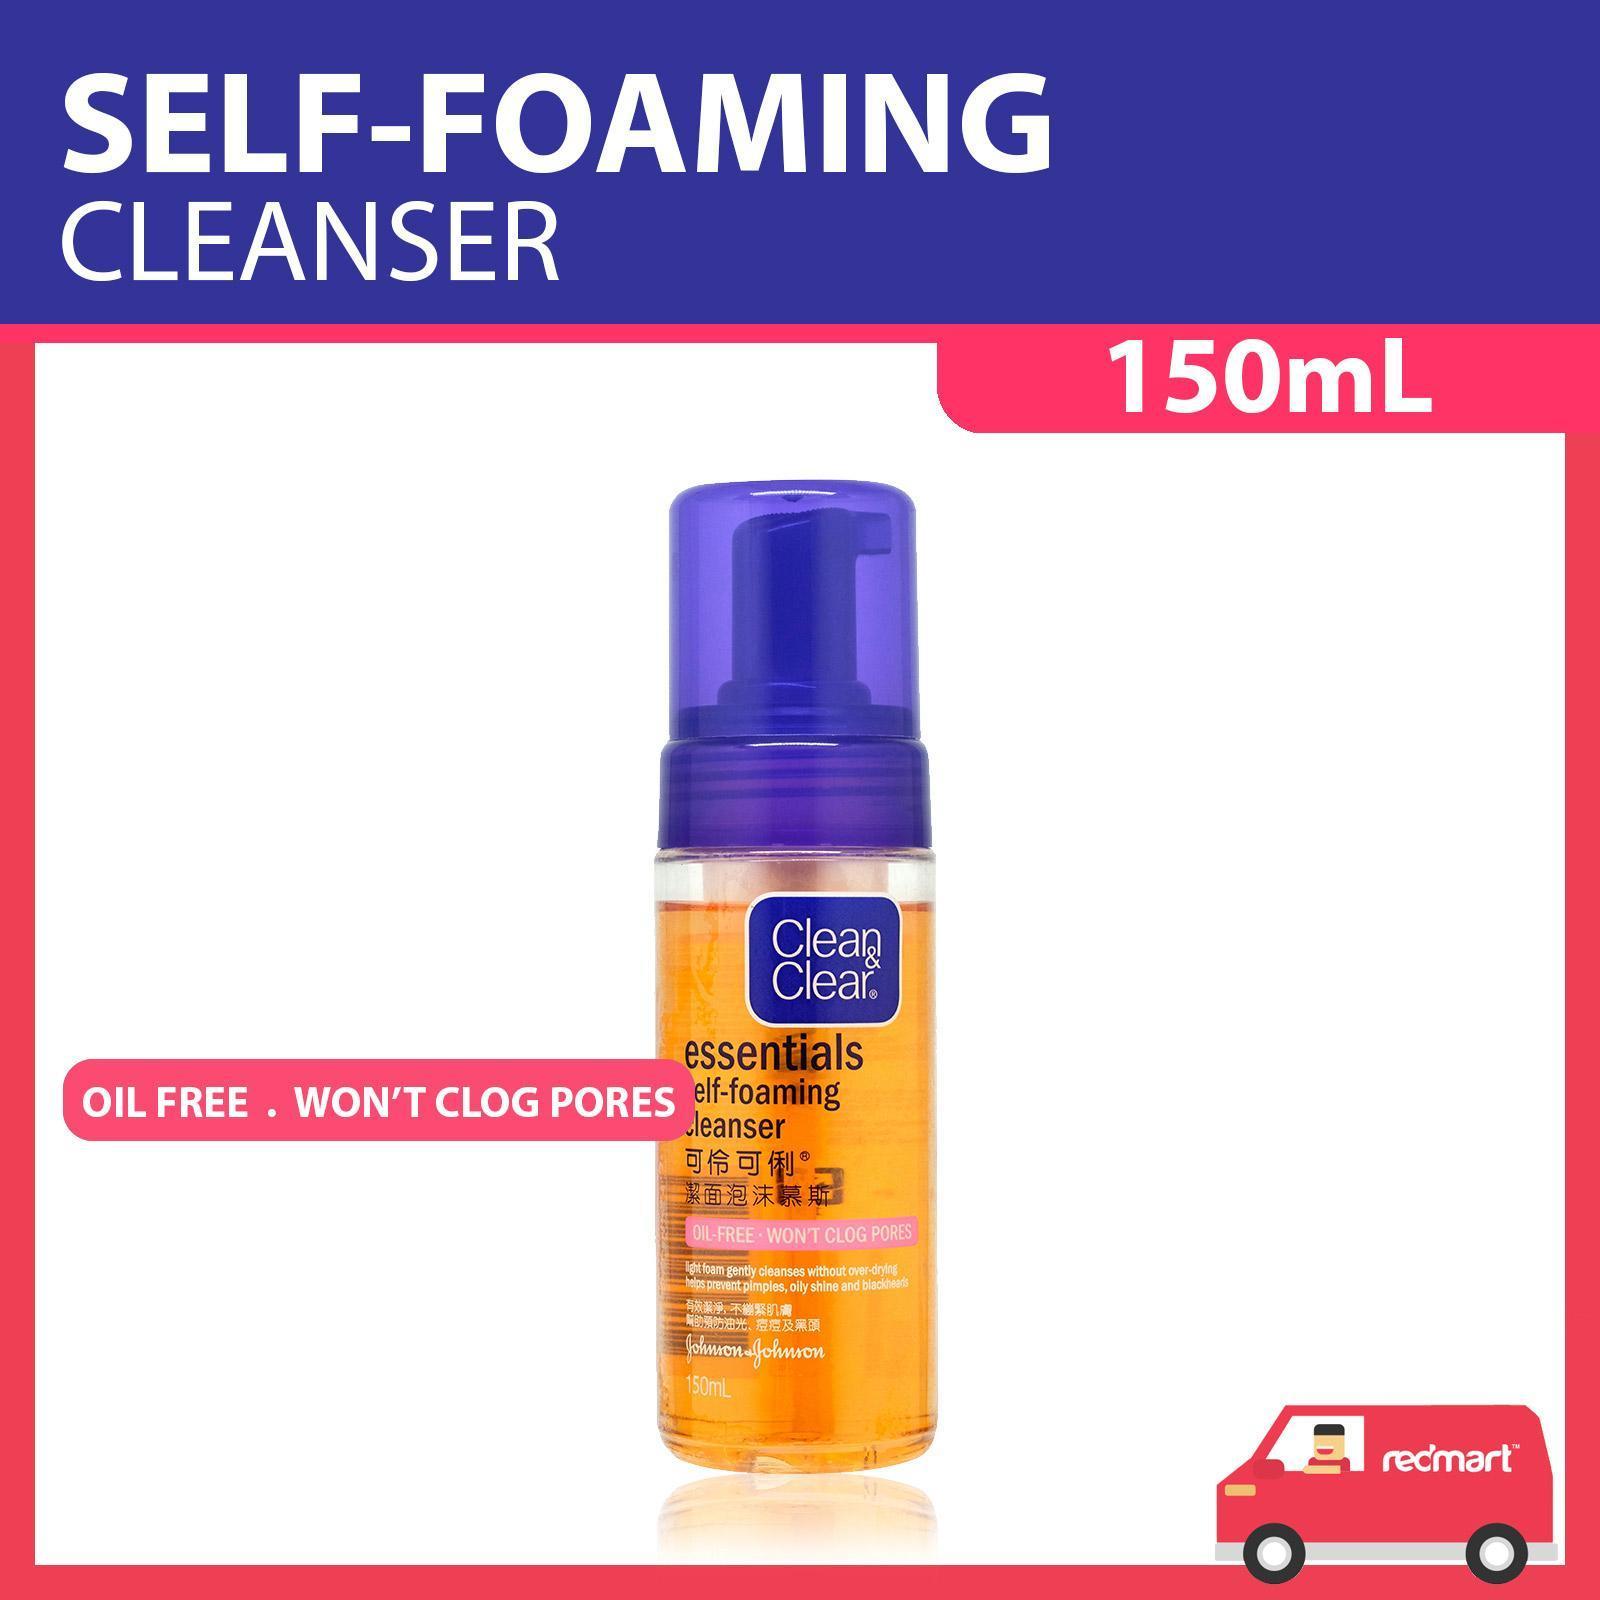 Clean & Clear Essentials Self-Foaming Oil-Free Cleanser